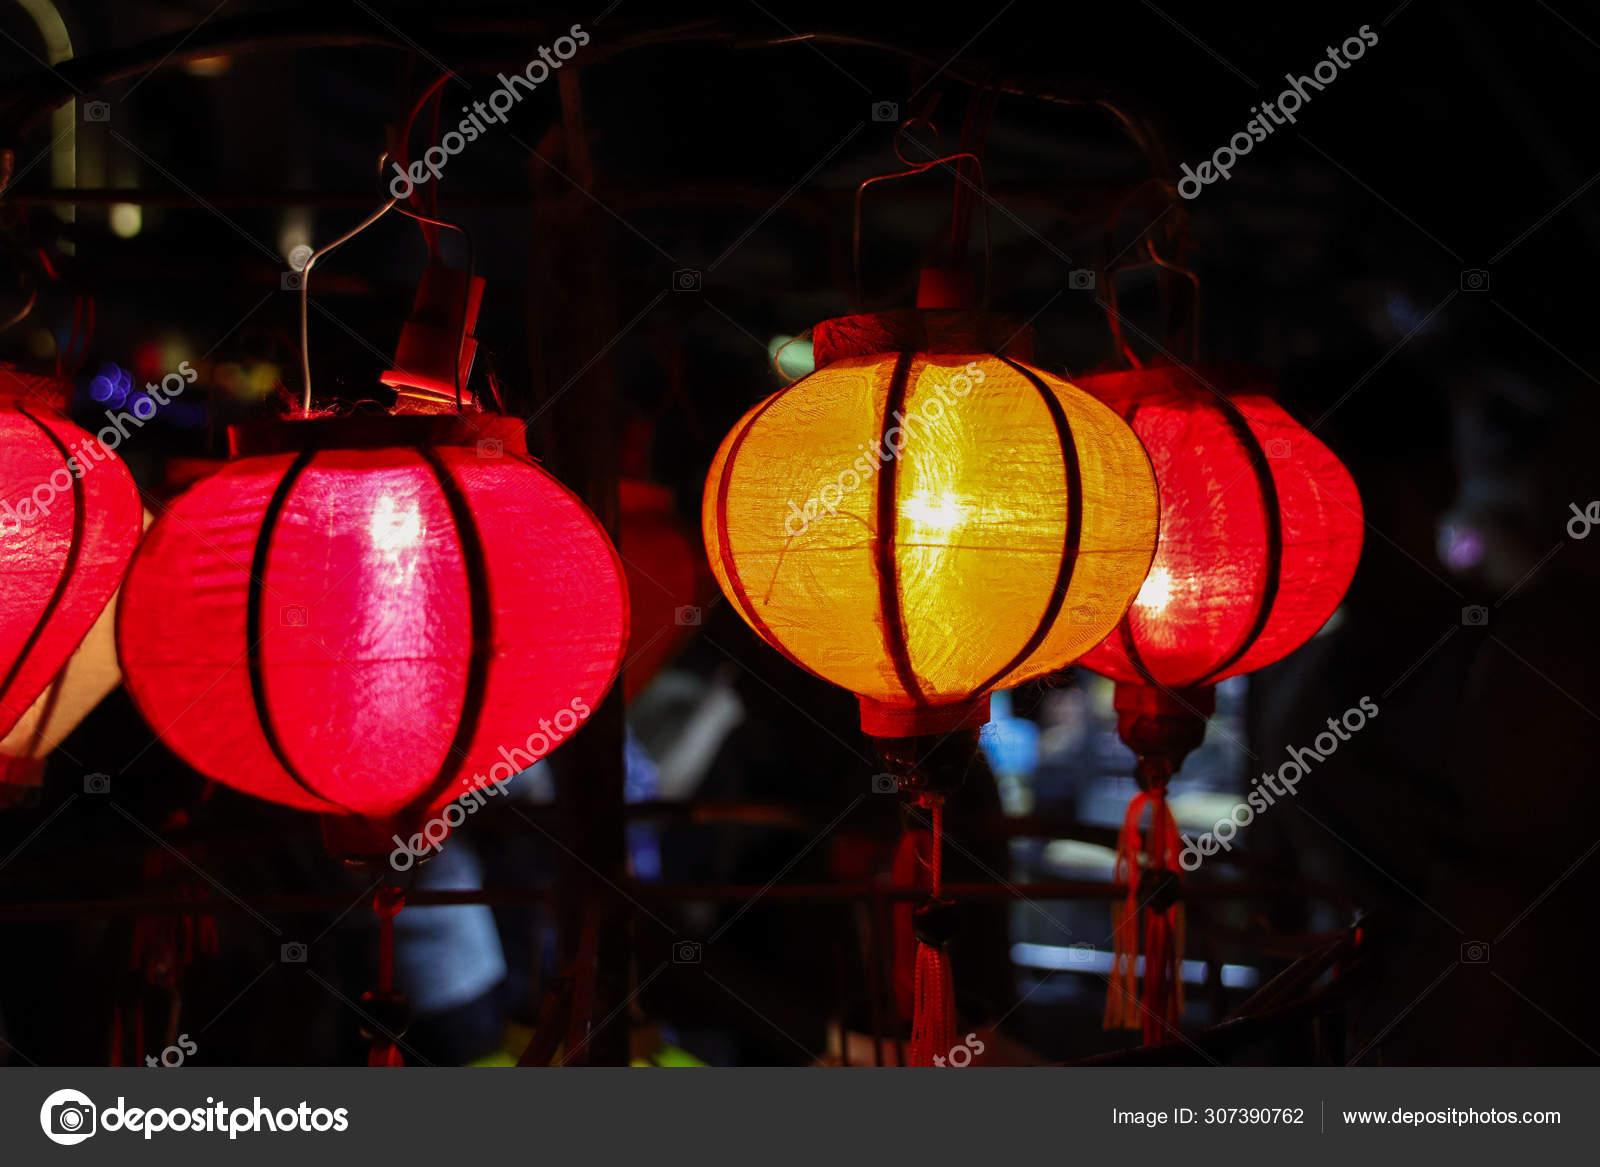 Famous Lanterns Hoi Vietnam Lantern Festival Stock Photo C Mcjvil 307390762